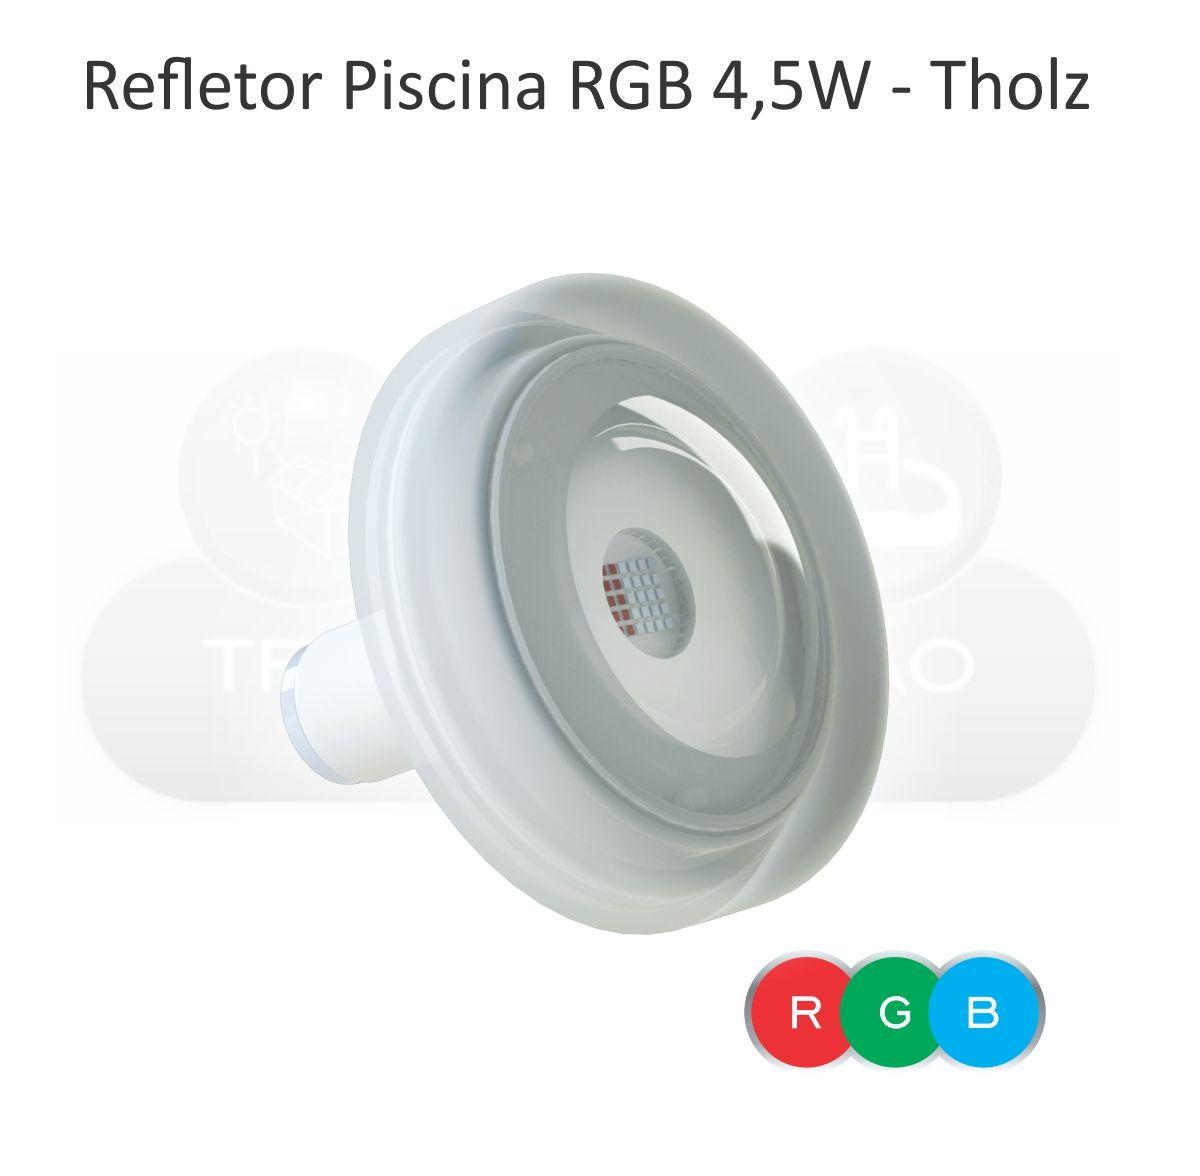 REFLETOR LED RGB - CABO 2M - 4,5W